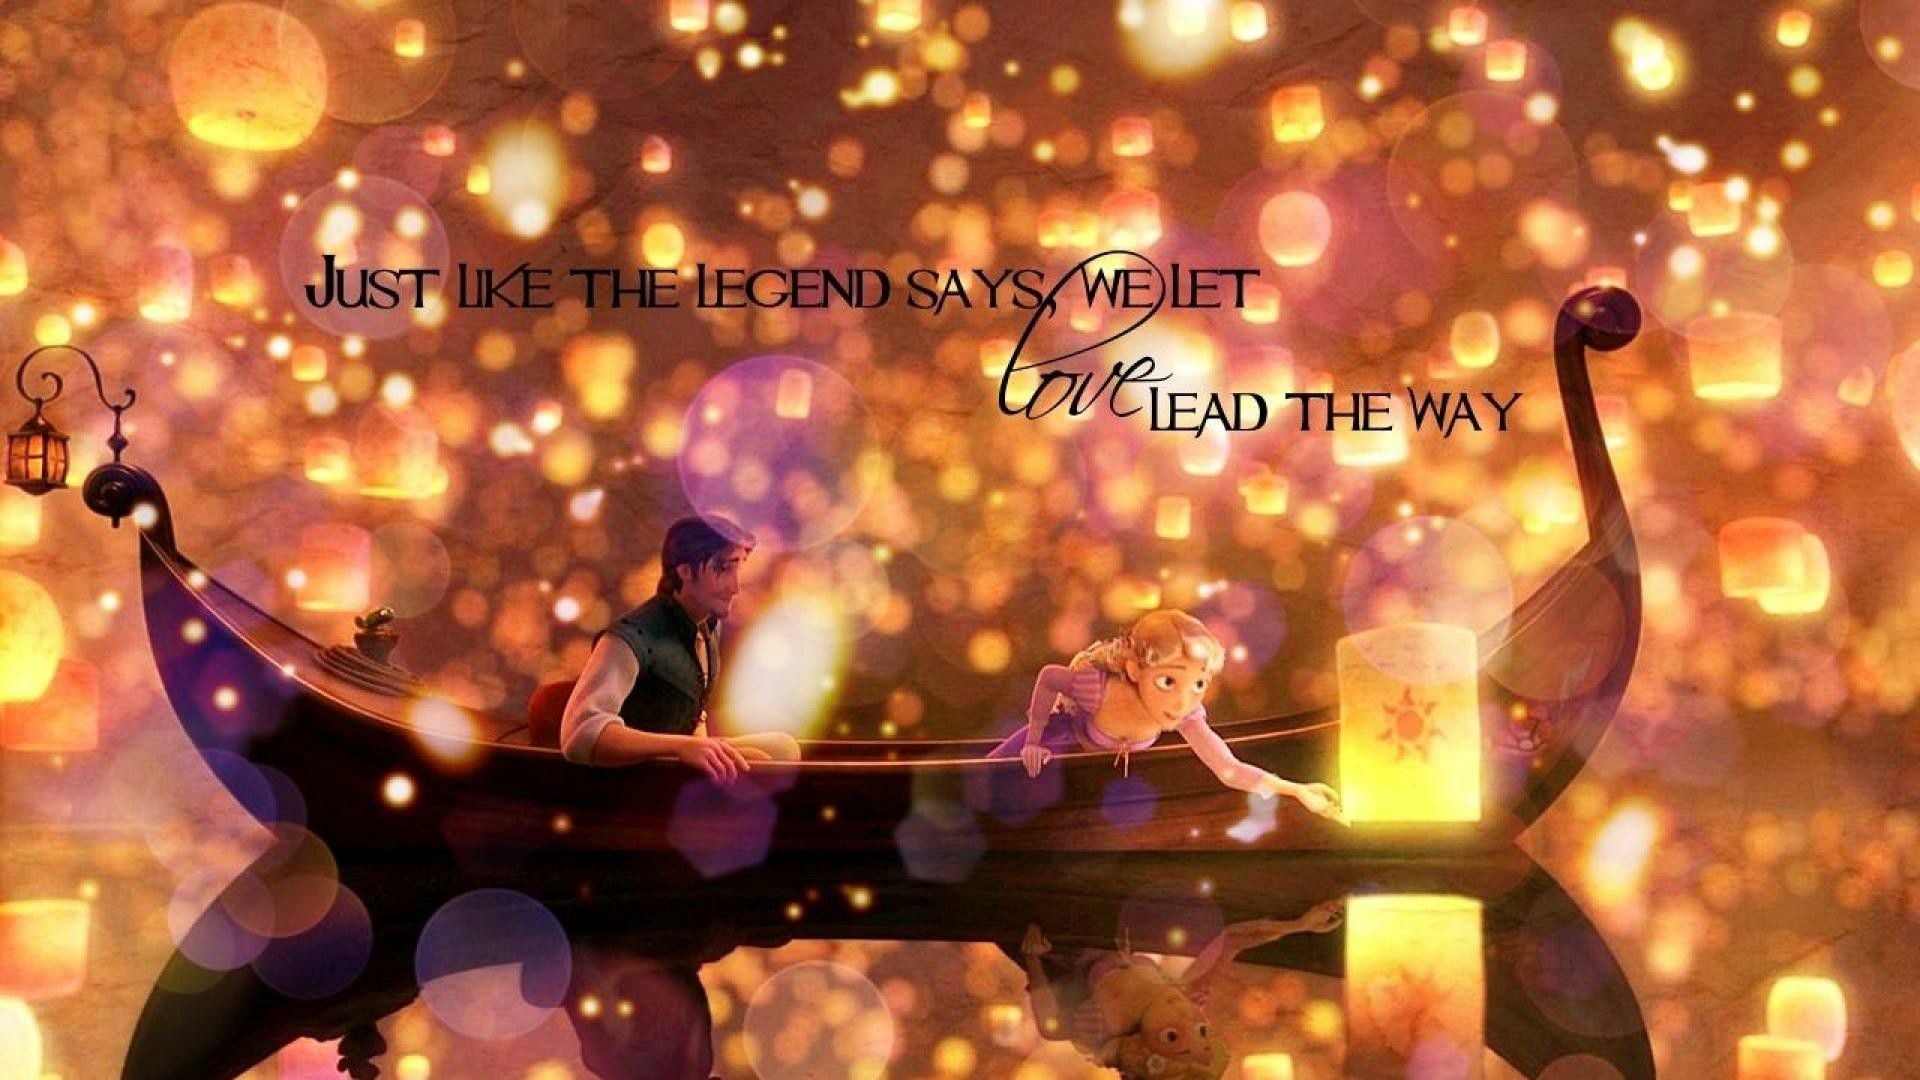 Disney princess rapunzel images